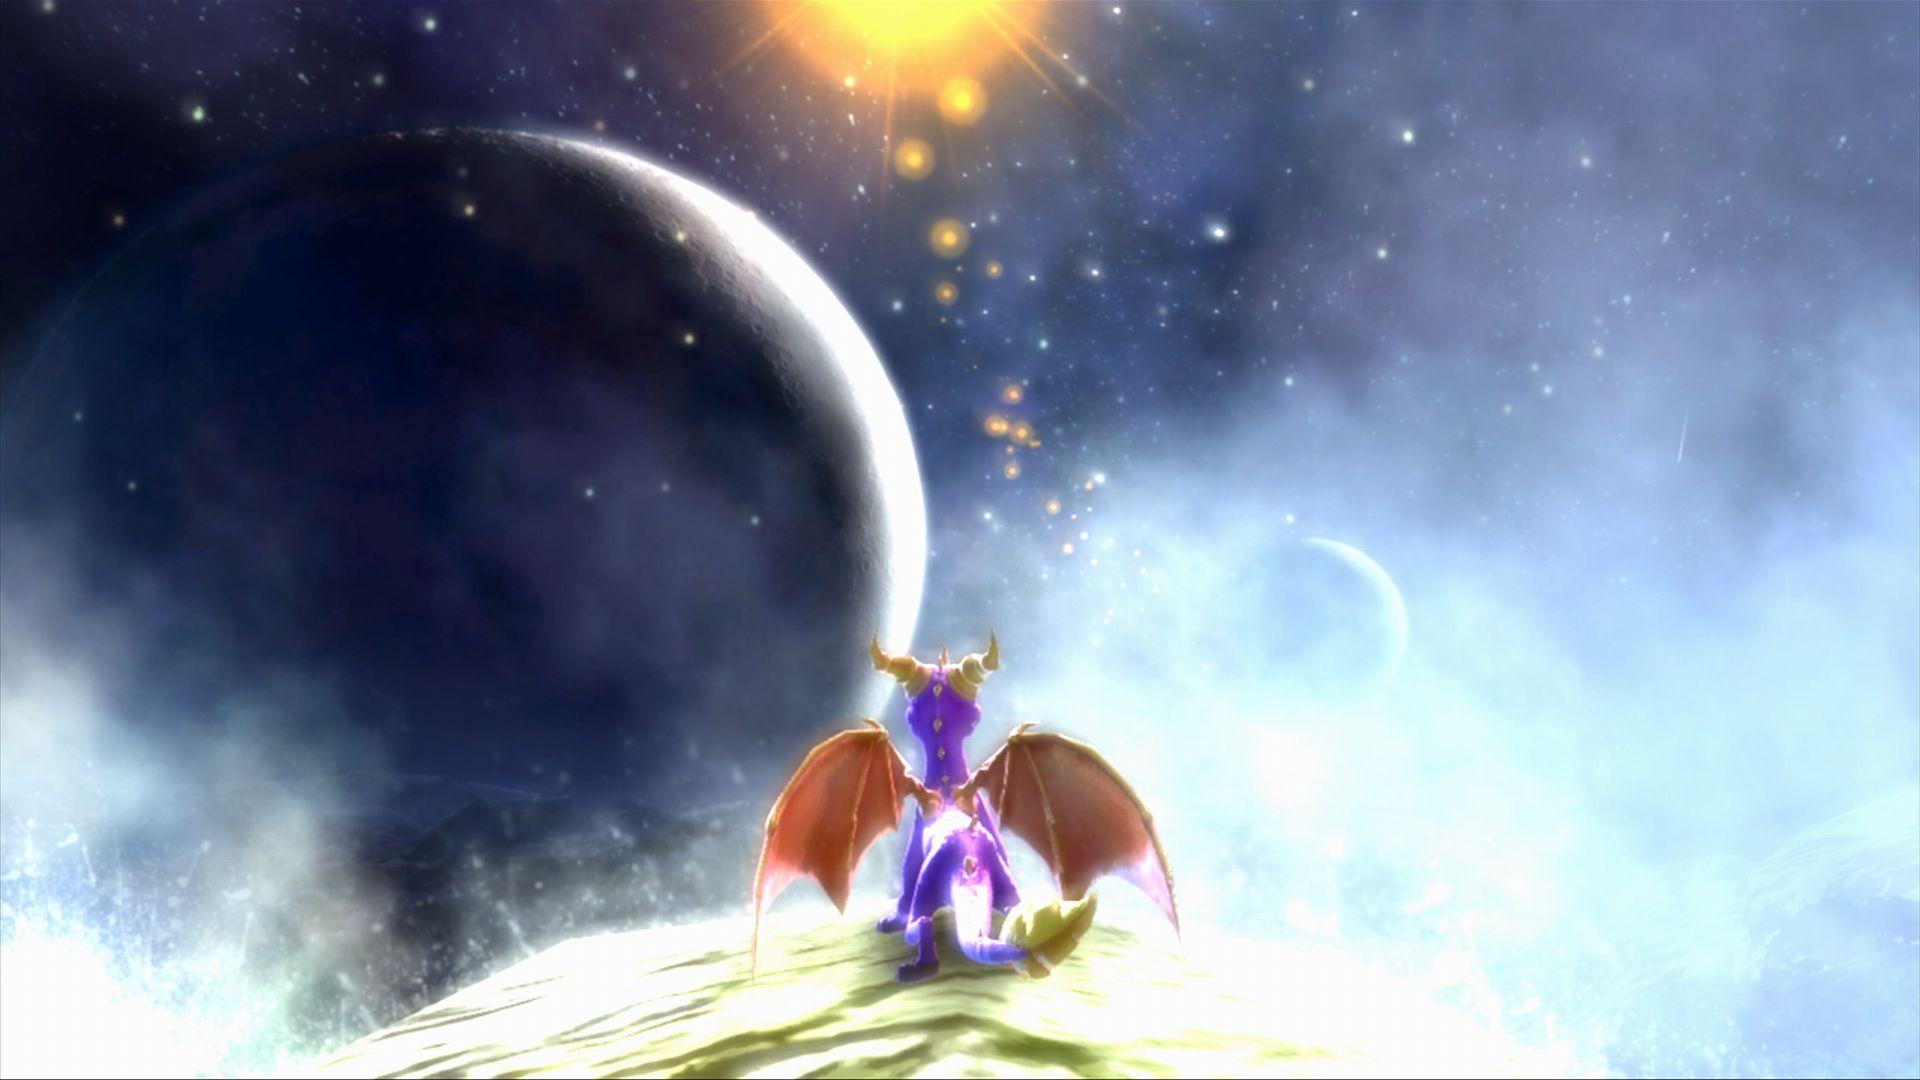 Spyro The Dragon Hd Wallpaper Legend Of Spyro Dawn Of The Dragon